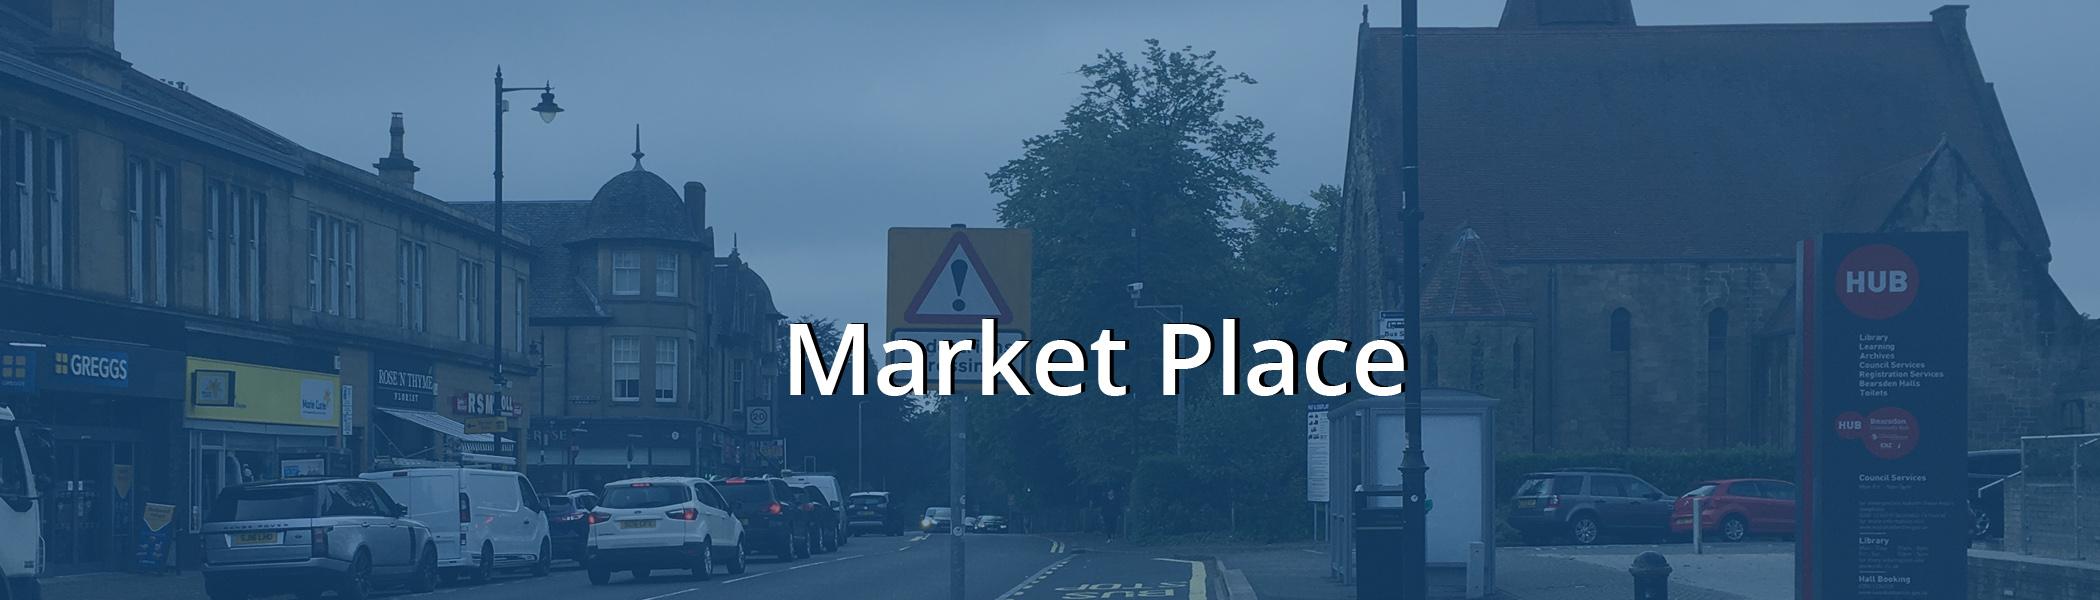 Bearsden Loves Local Market Place